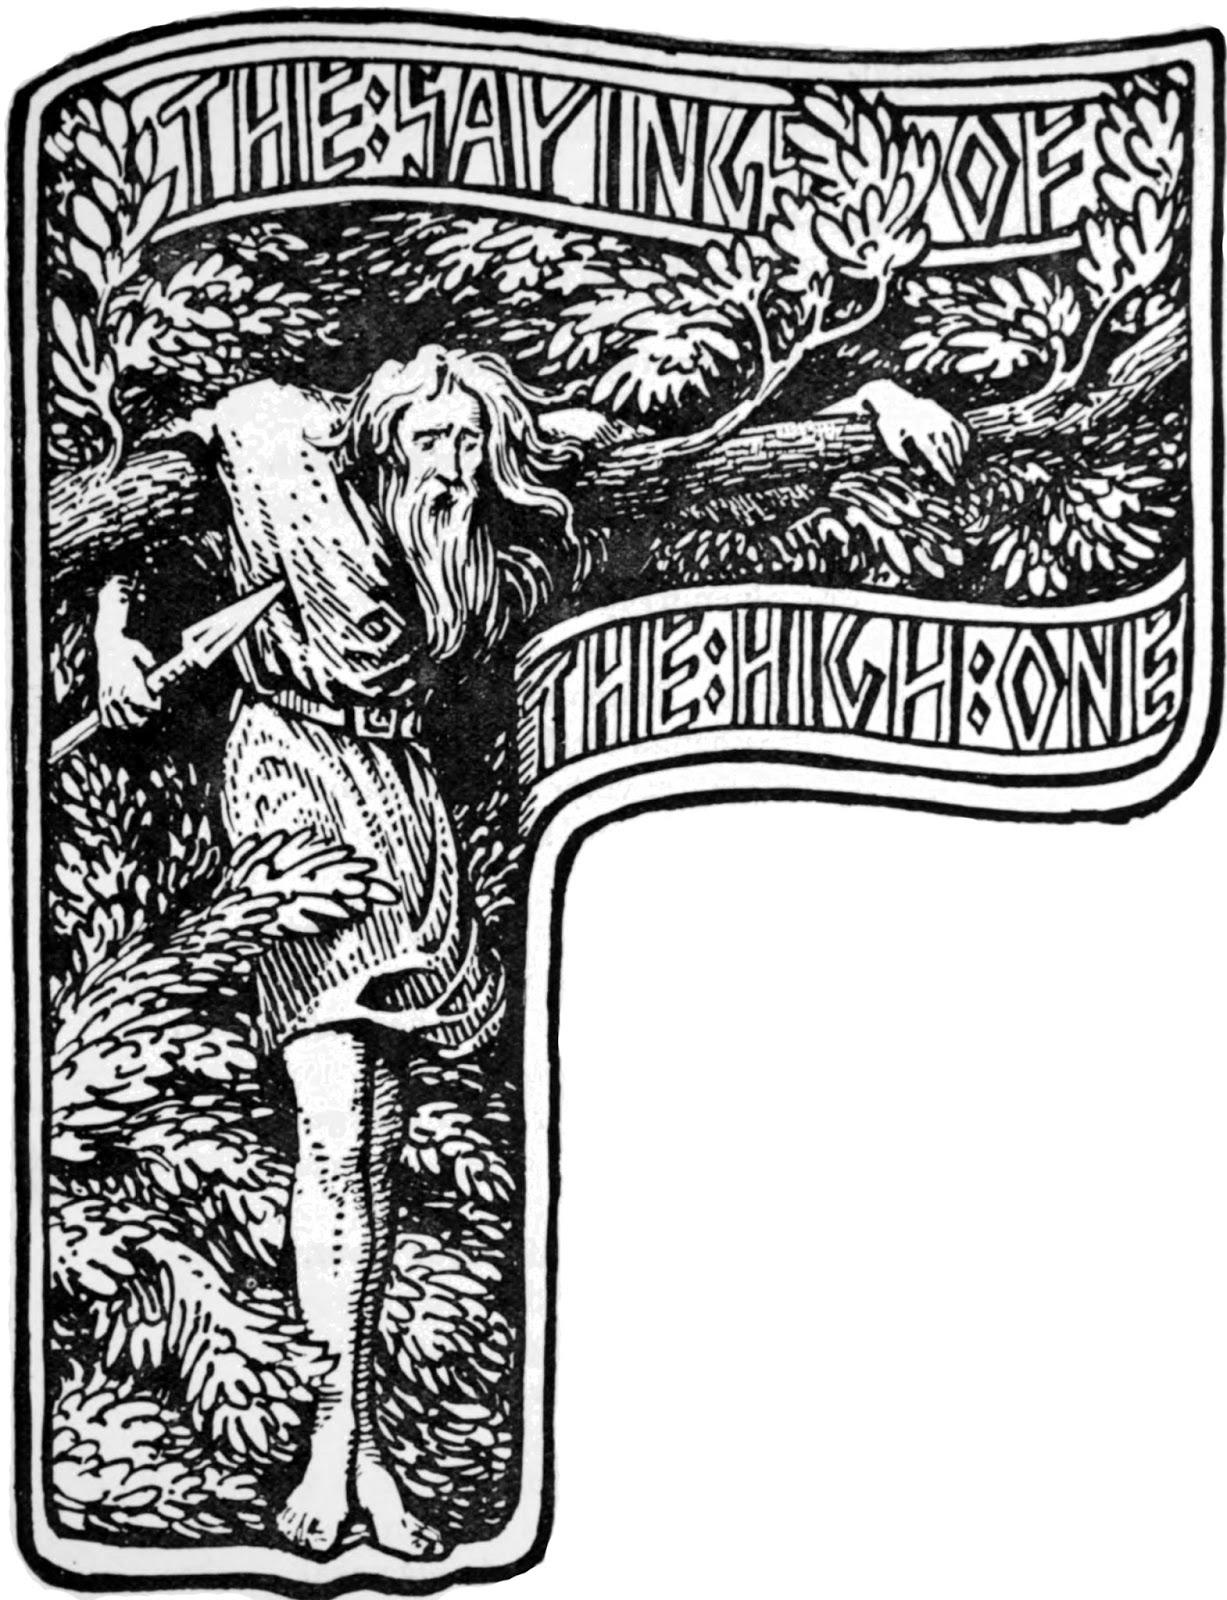 Scot's Blog: Norse Mythology Source Texts: The Elder Edda.